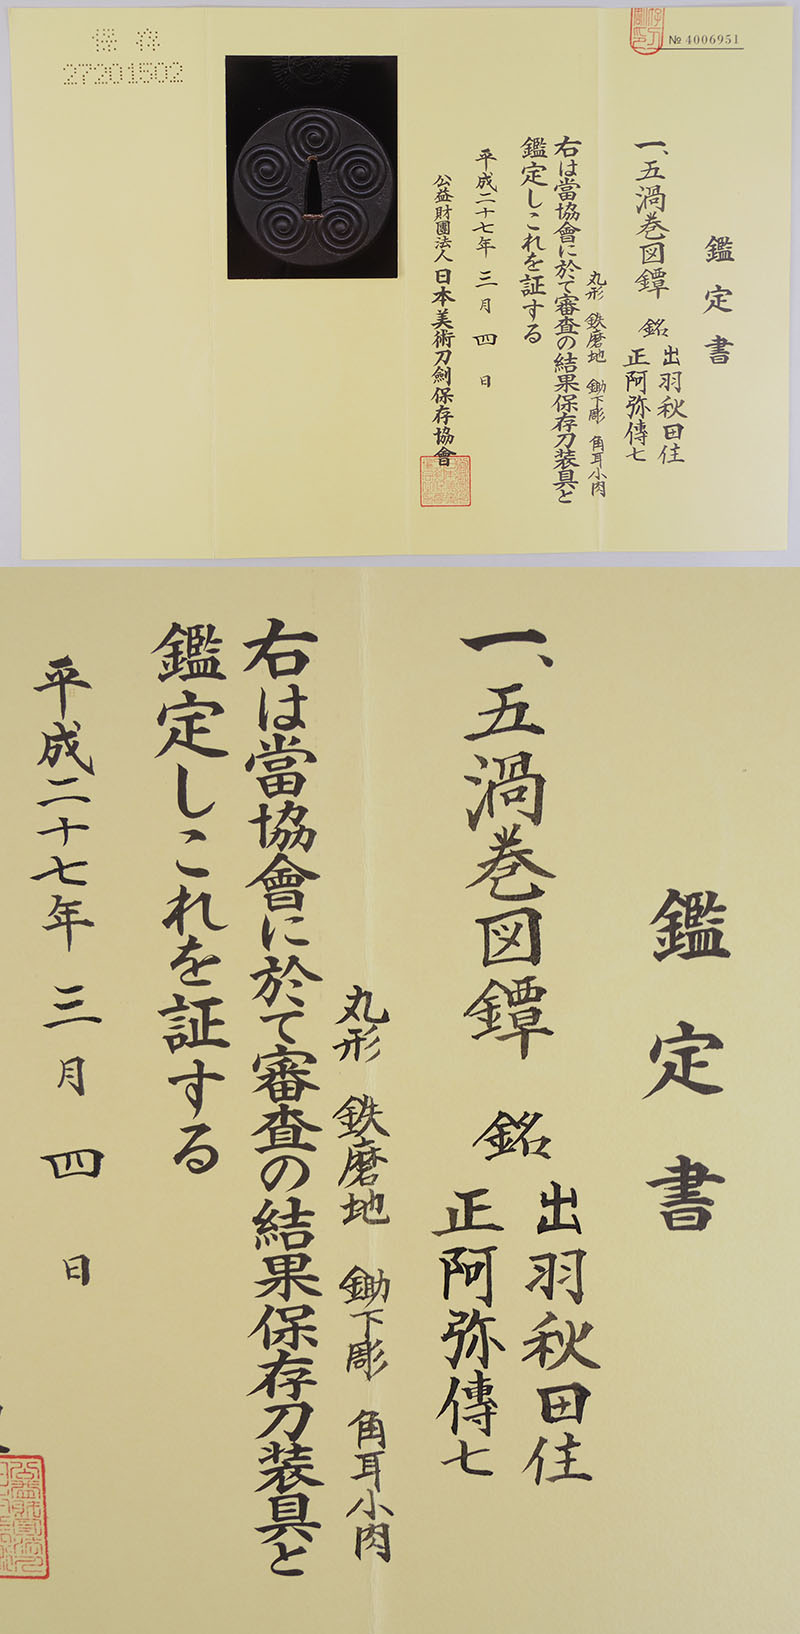 五渦巻図鍔 出羽秋田住 正阿弥傳七 Picture of Certificate